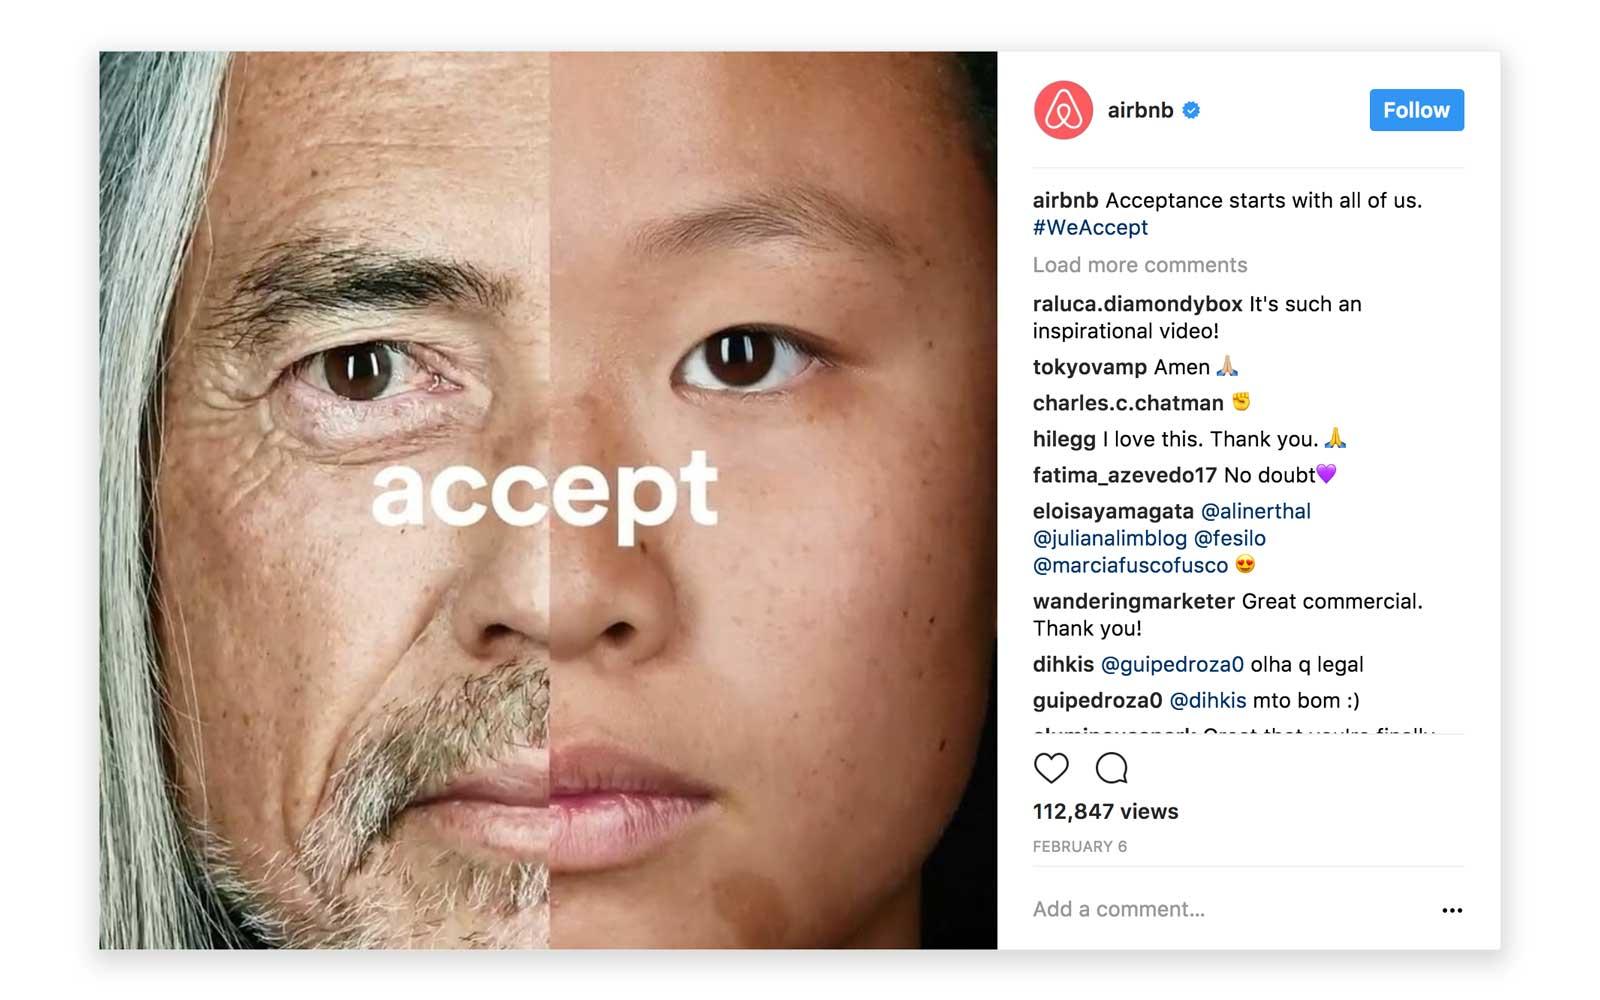 airbnb weaccept instagram post